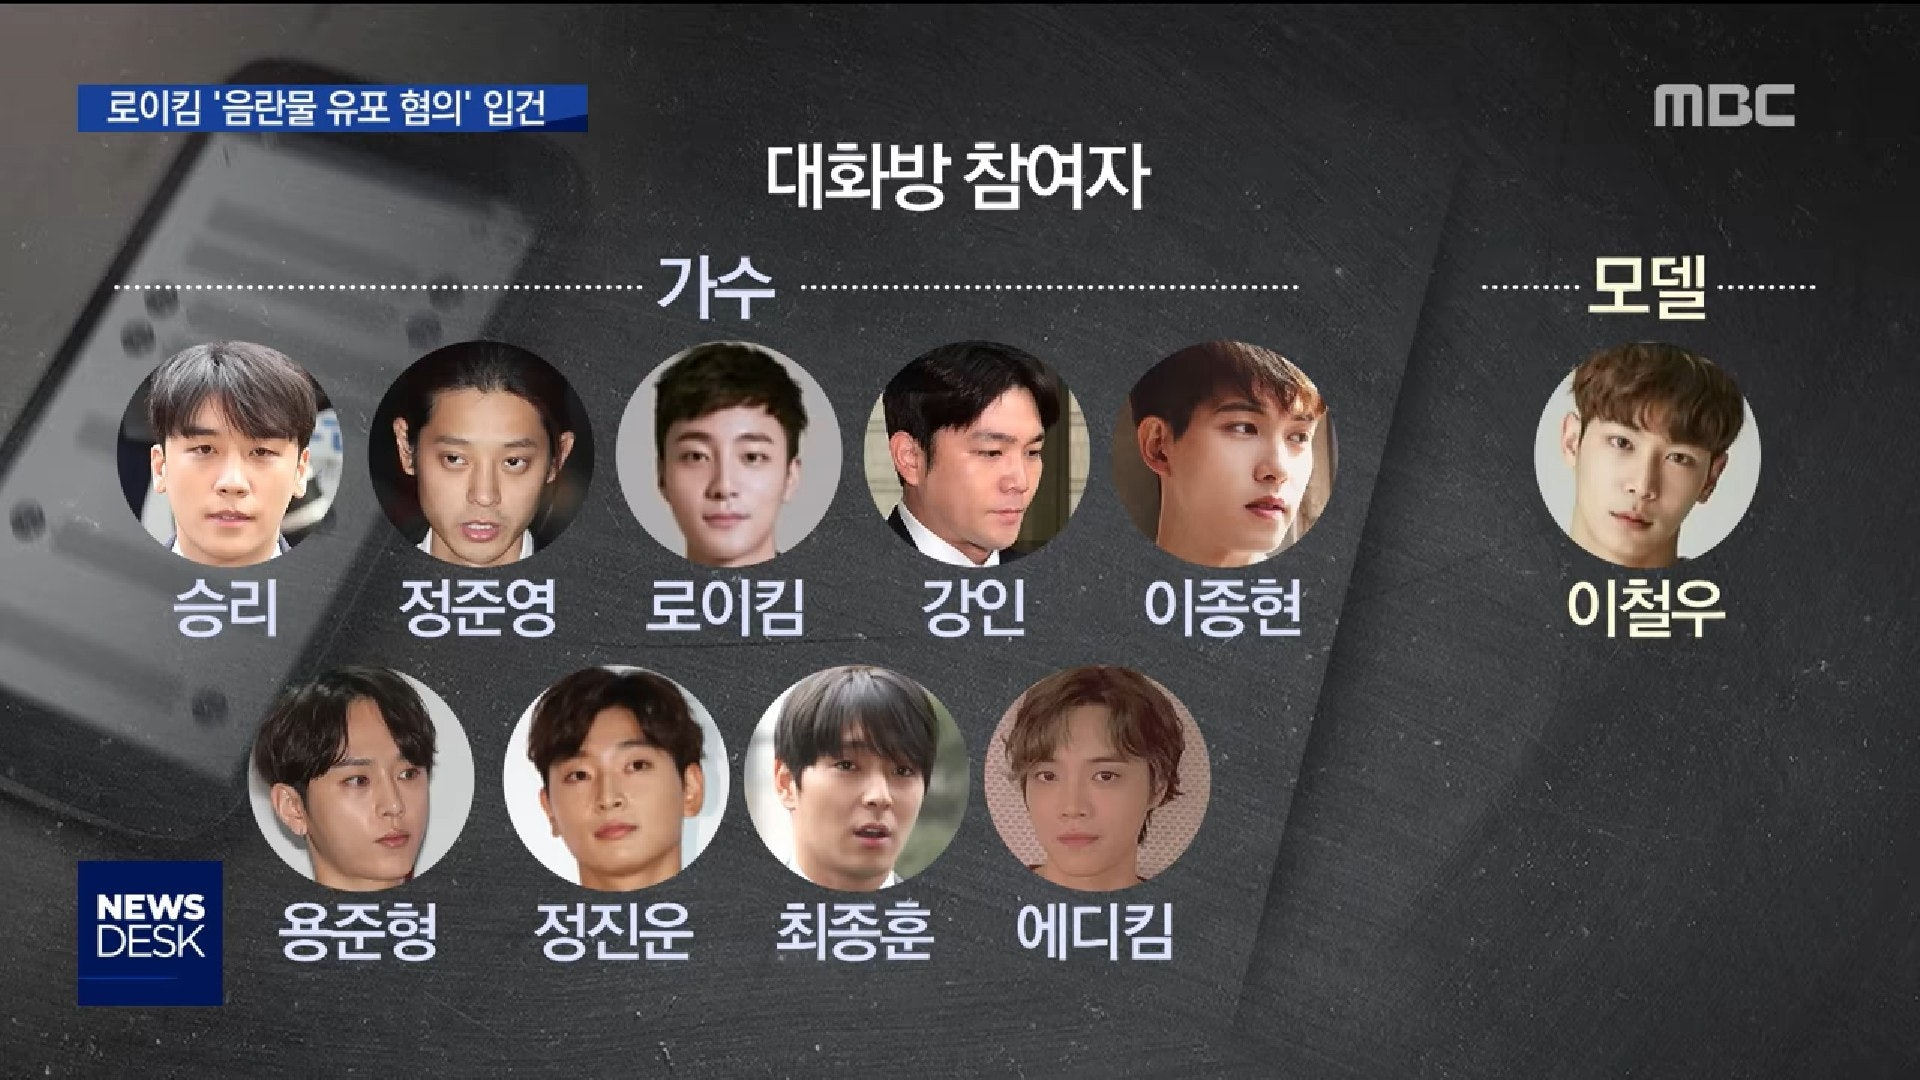 MBS《NEWS DESK》昨日(4日)公開鄭俊英聊天室10位成員名單。(影片截圖)